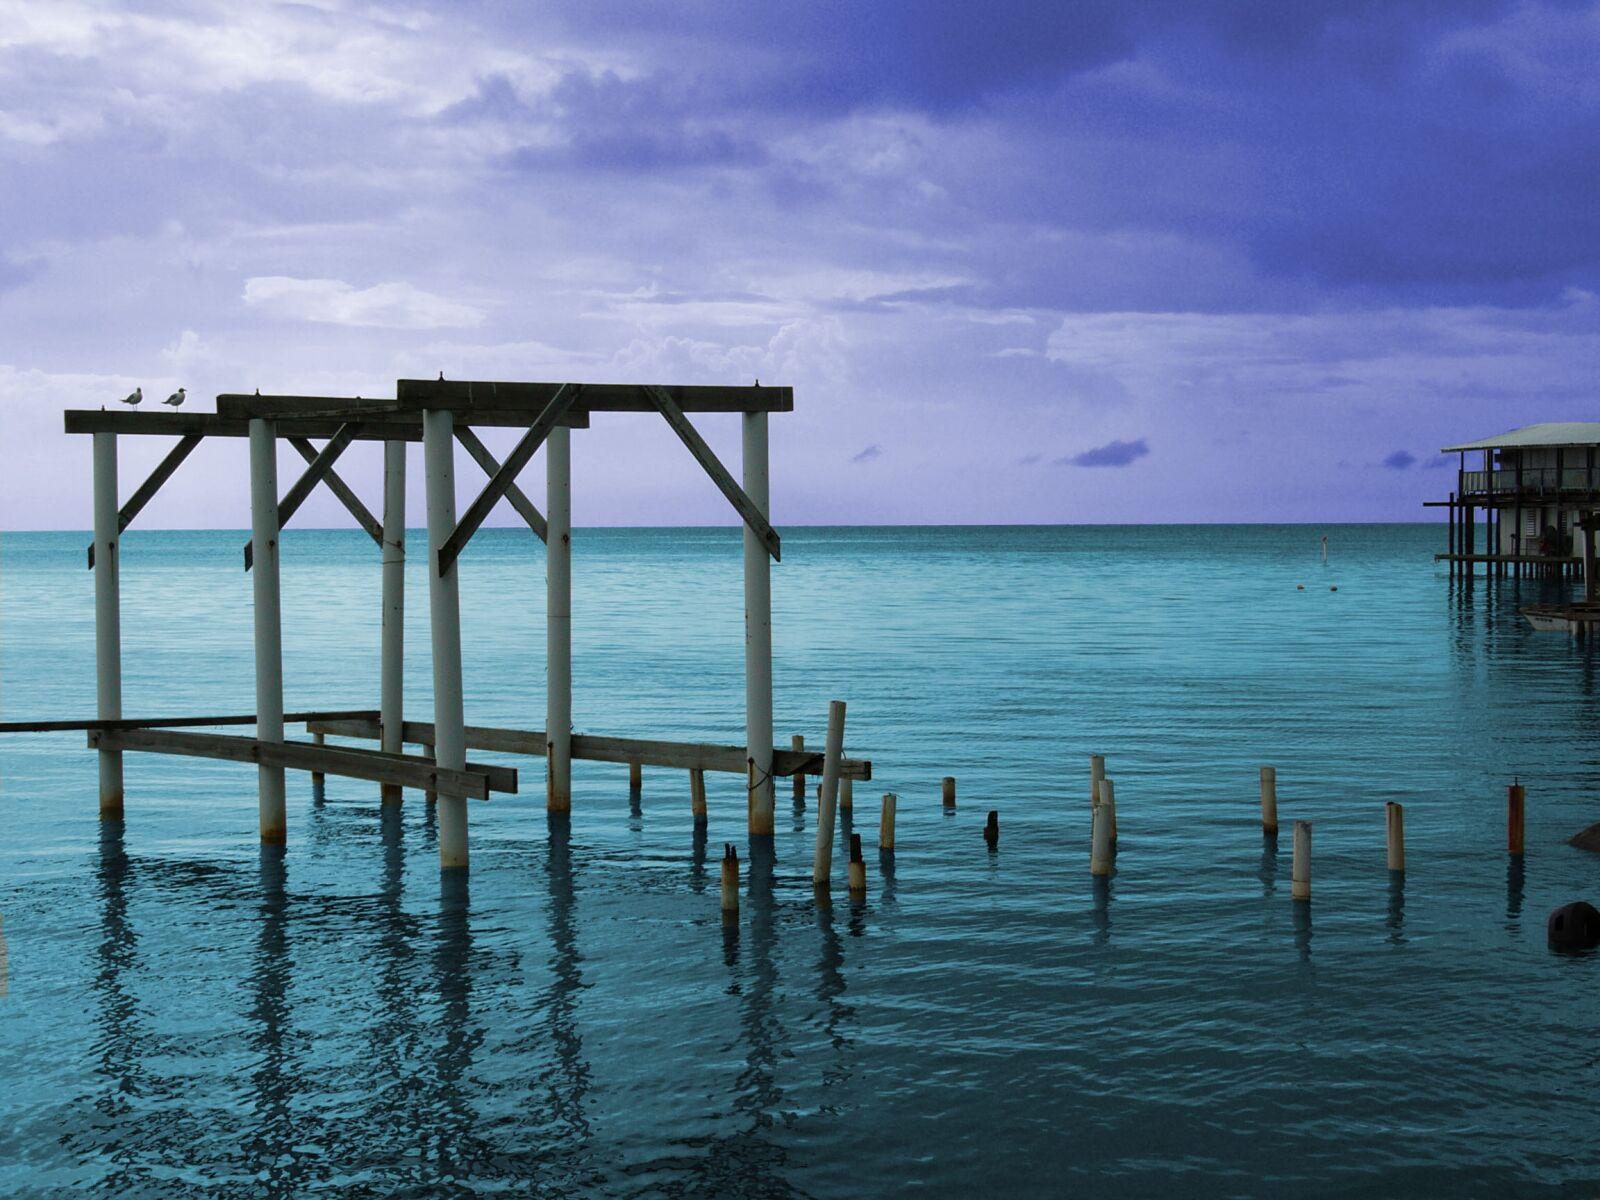 water, sea, pier